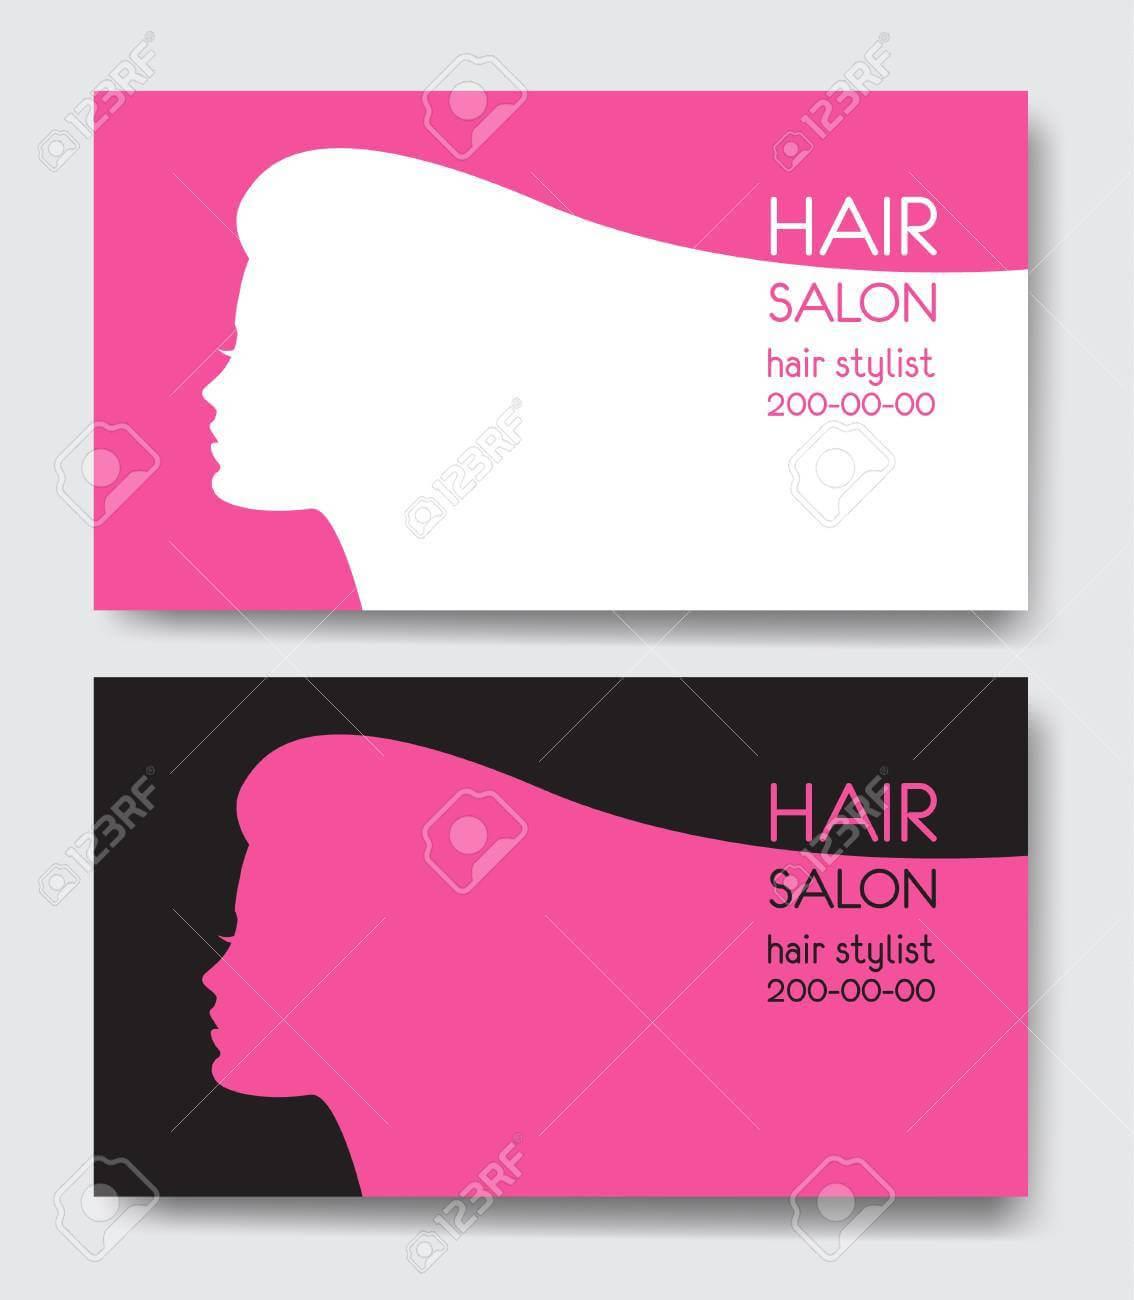 Hair Salon Business Card Templates. Regarding Hair Salon Business Card Template